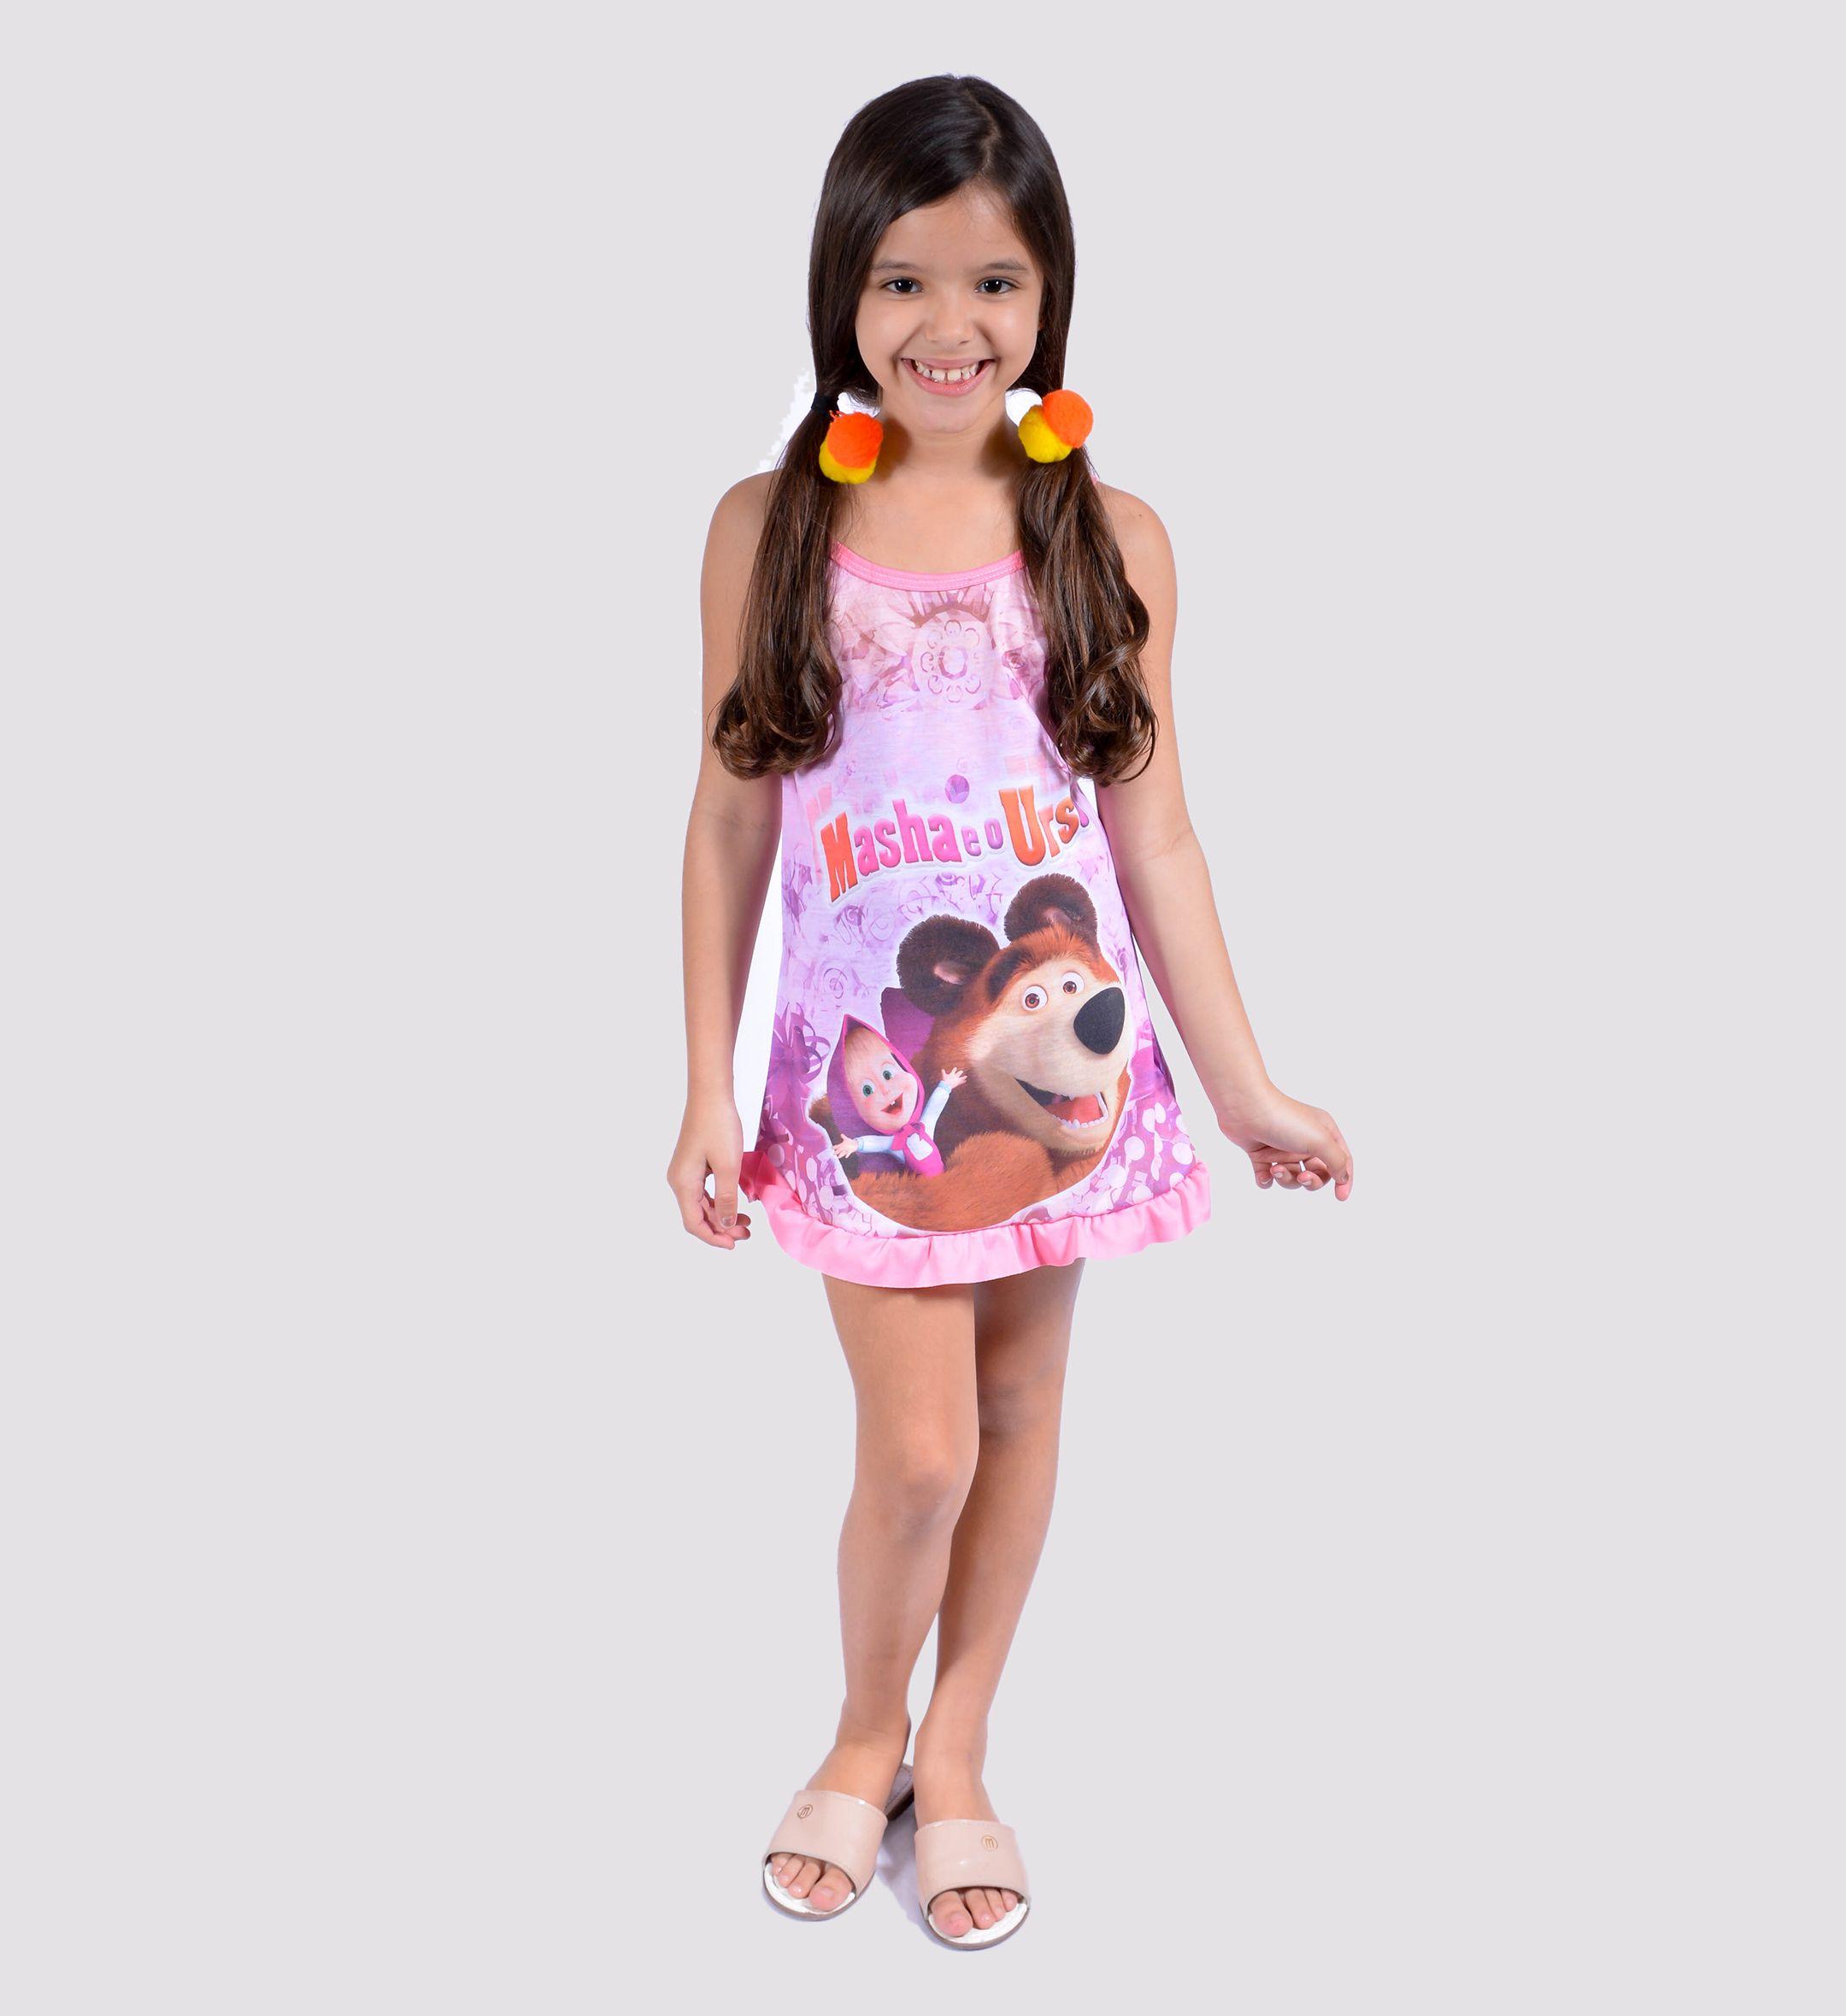 571da568f Camisola Infantil REF  900 (lote 10 UN)R 6